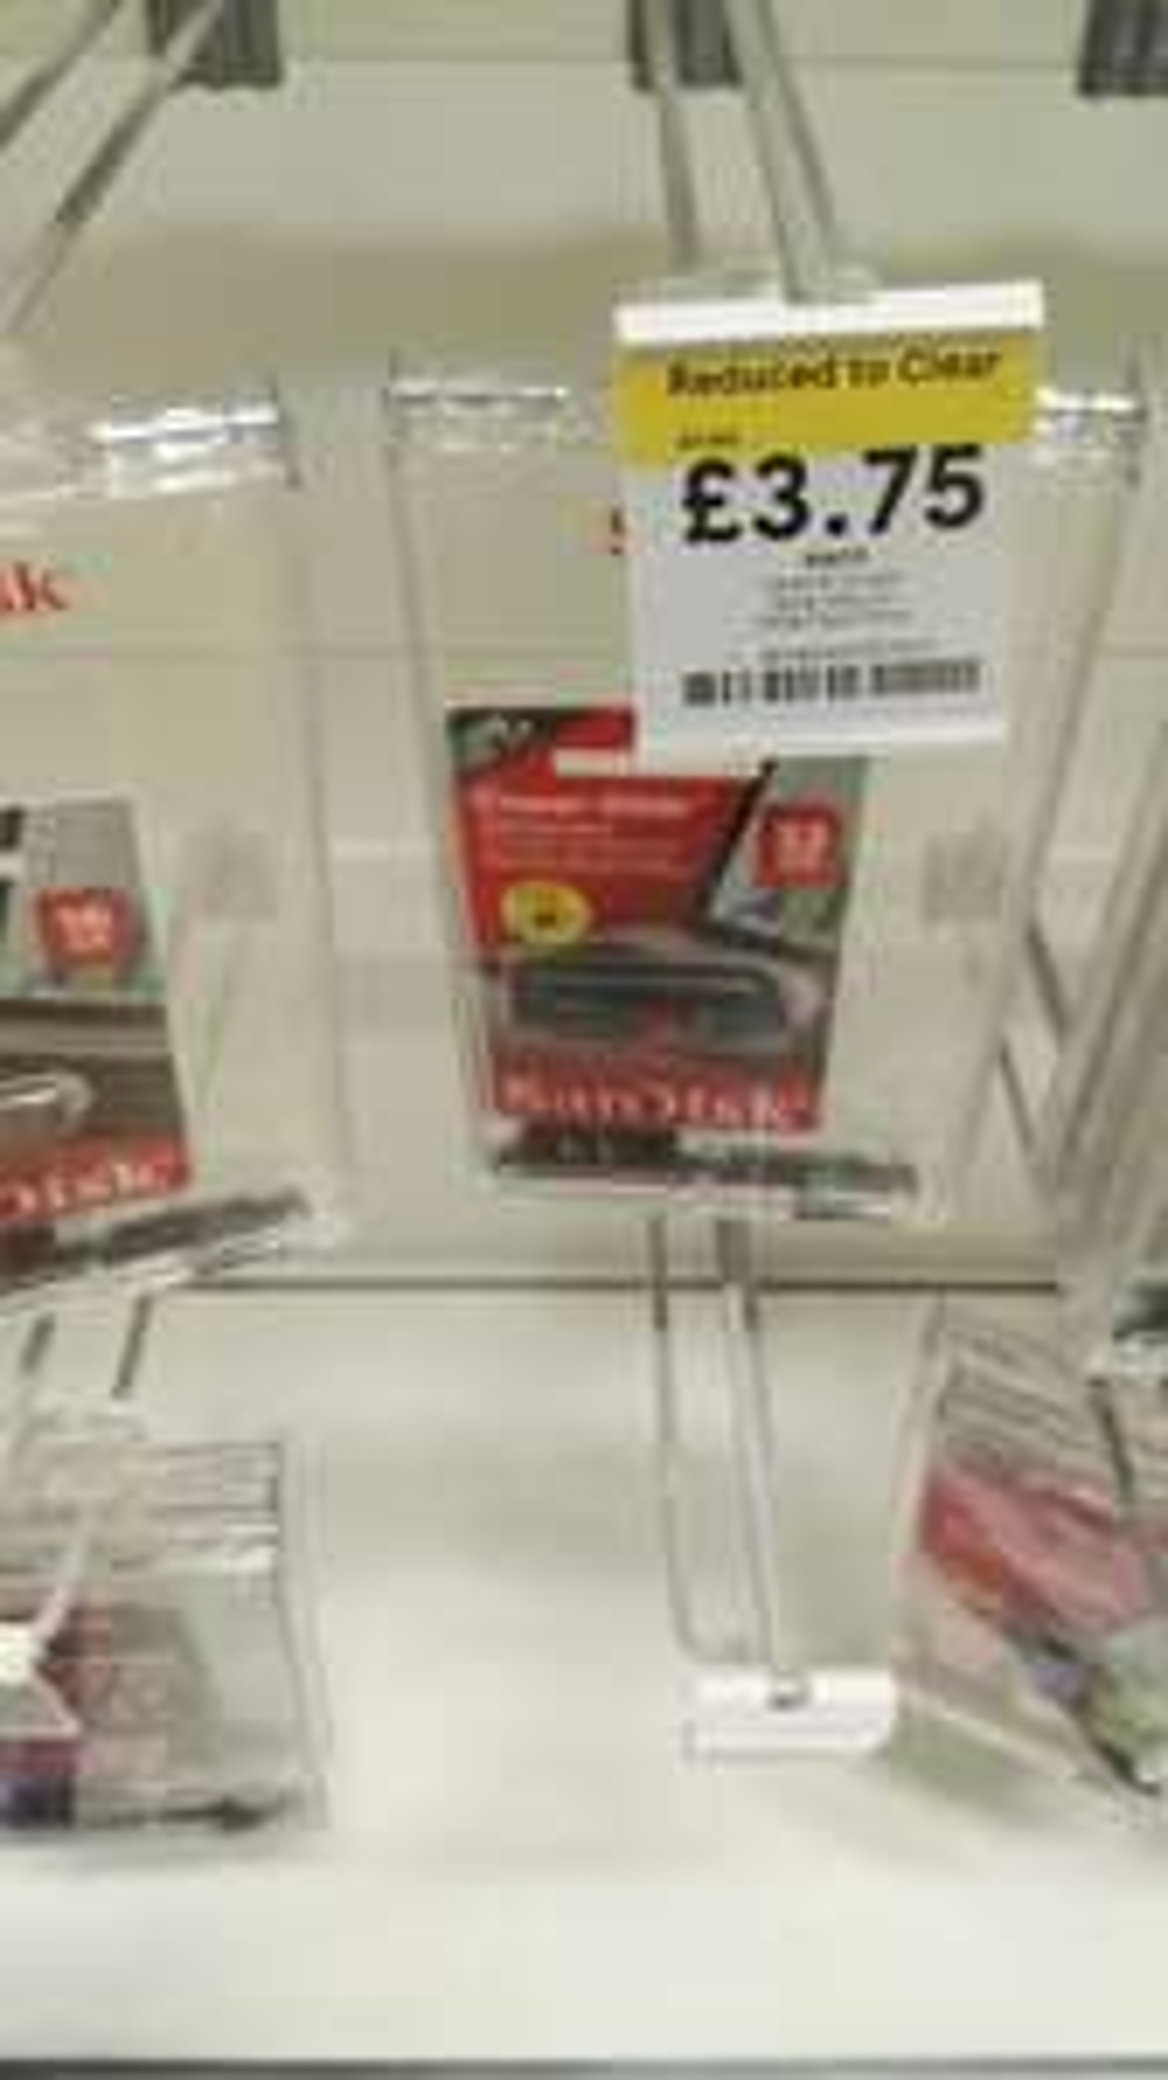 Sandisk cruzer glide usb stick 32gb £3.75 instore @ Tesco